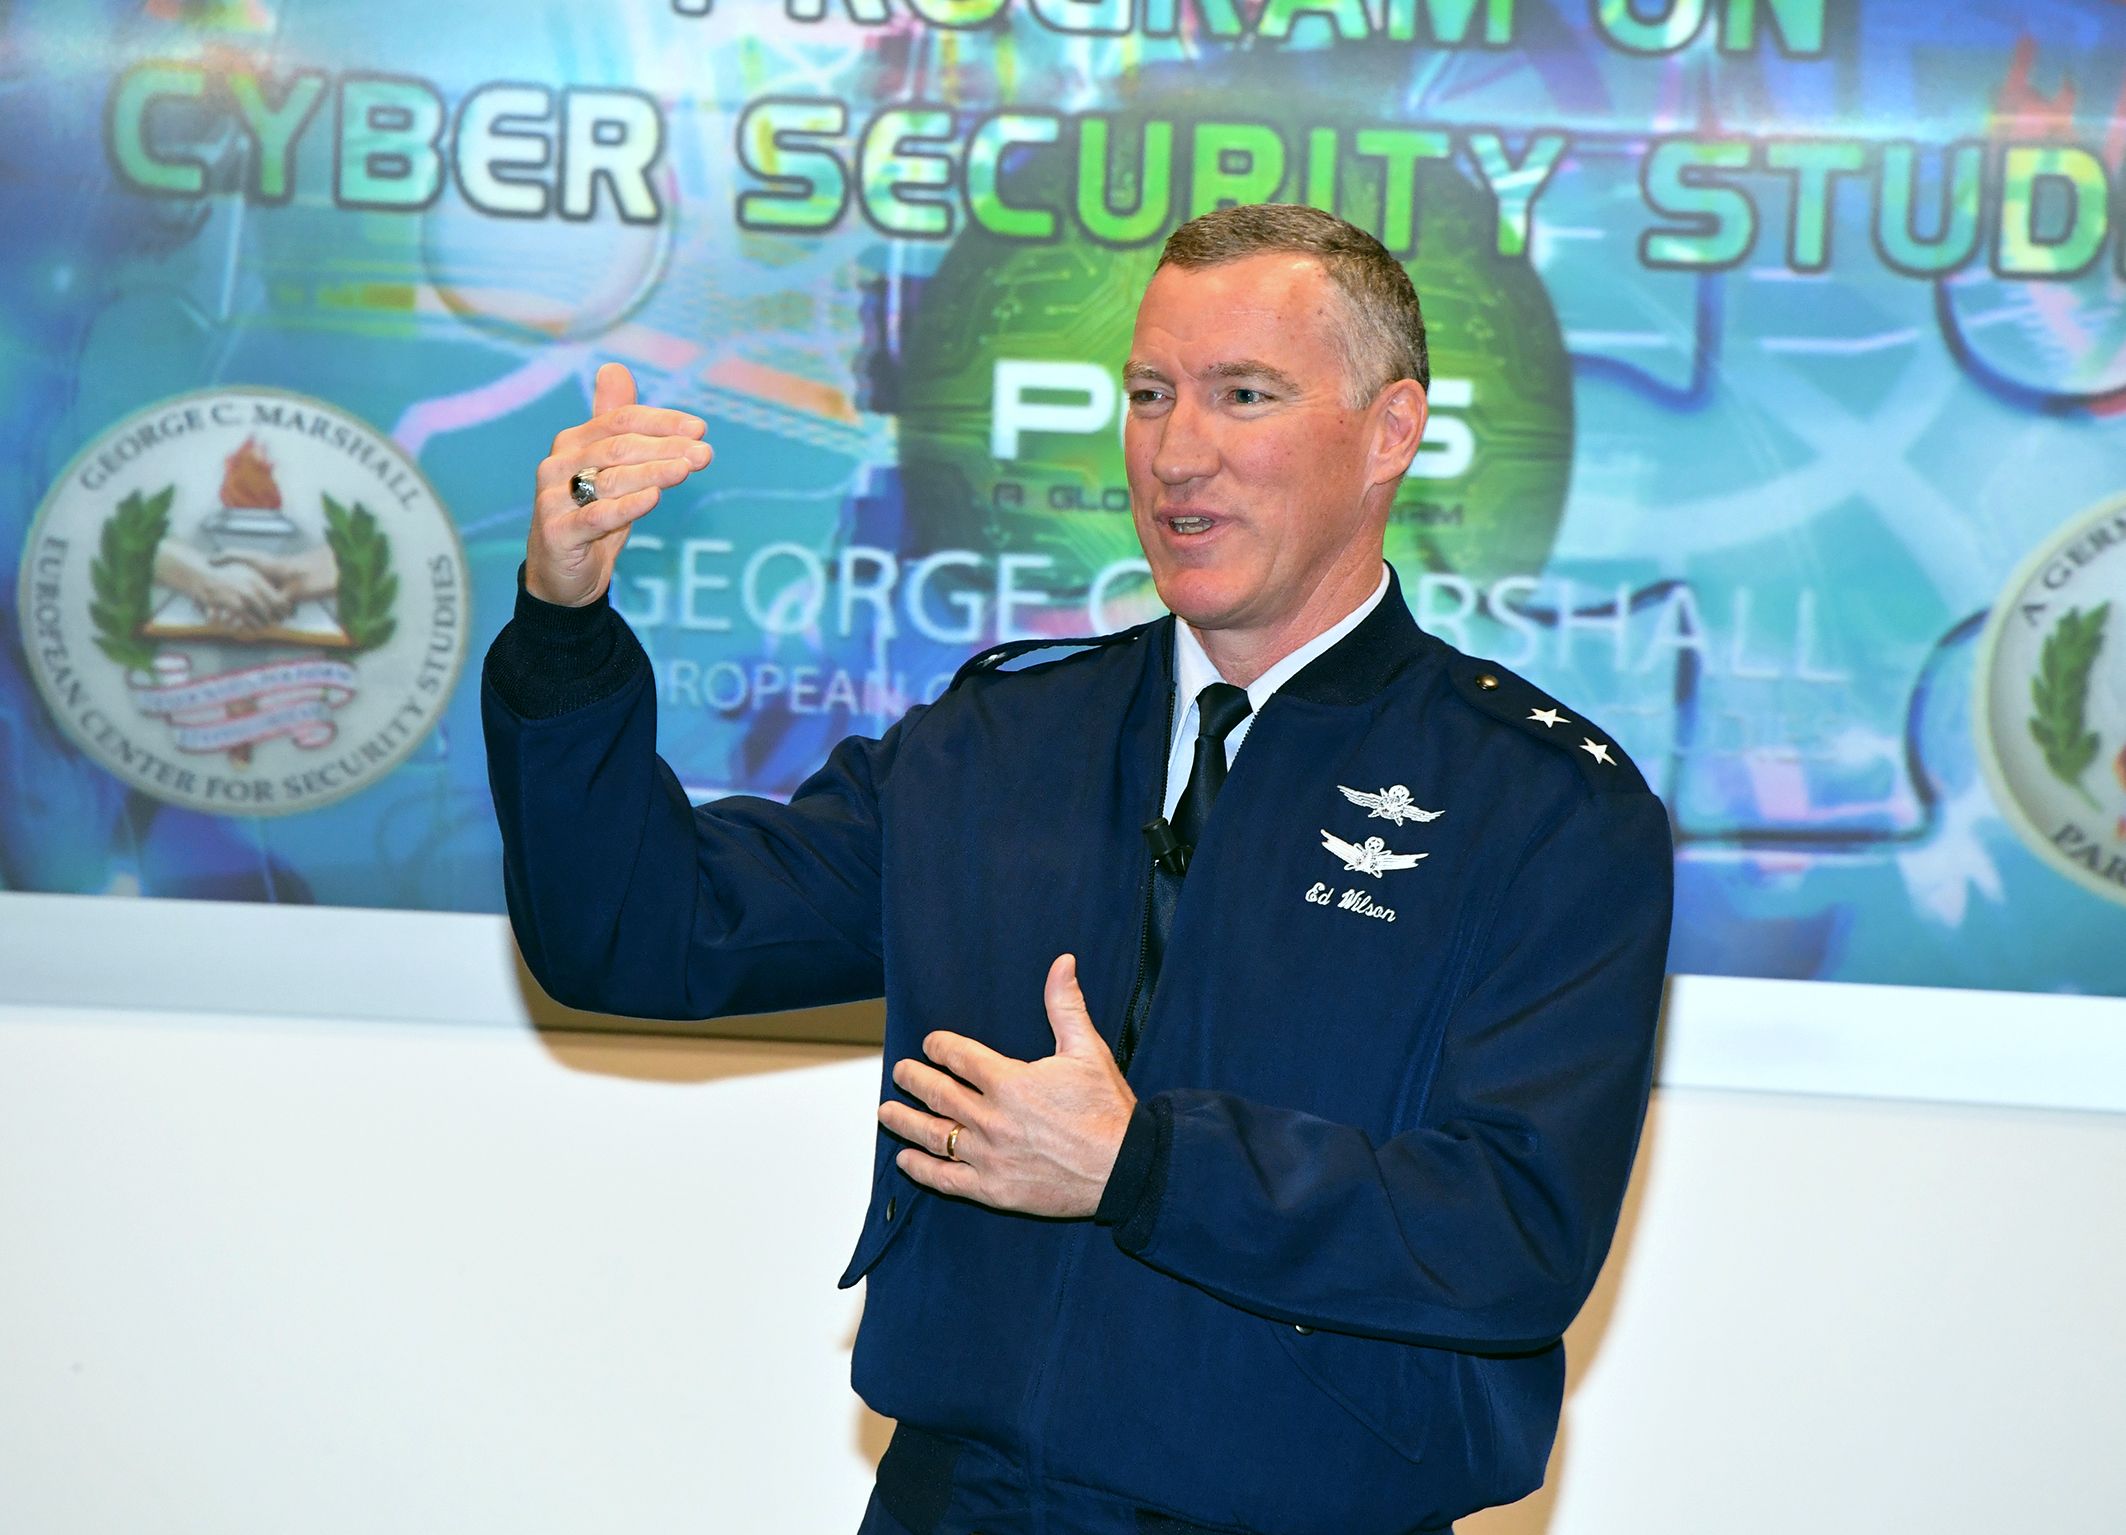 https://media.defense.gov/2017/Dec/06/2001853141/-1/-1/0/171205-D-DM356-0259.JPG